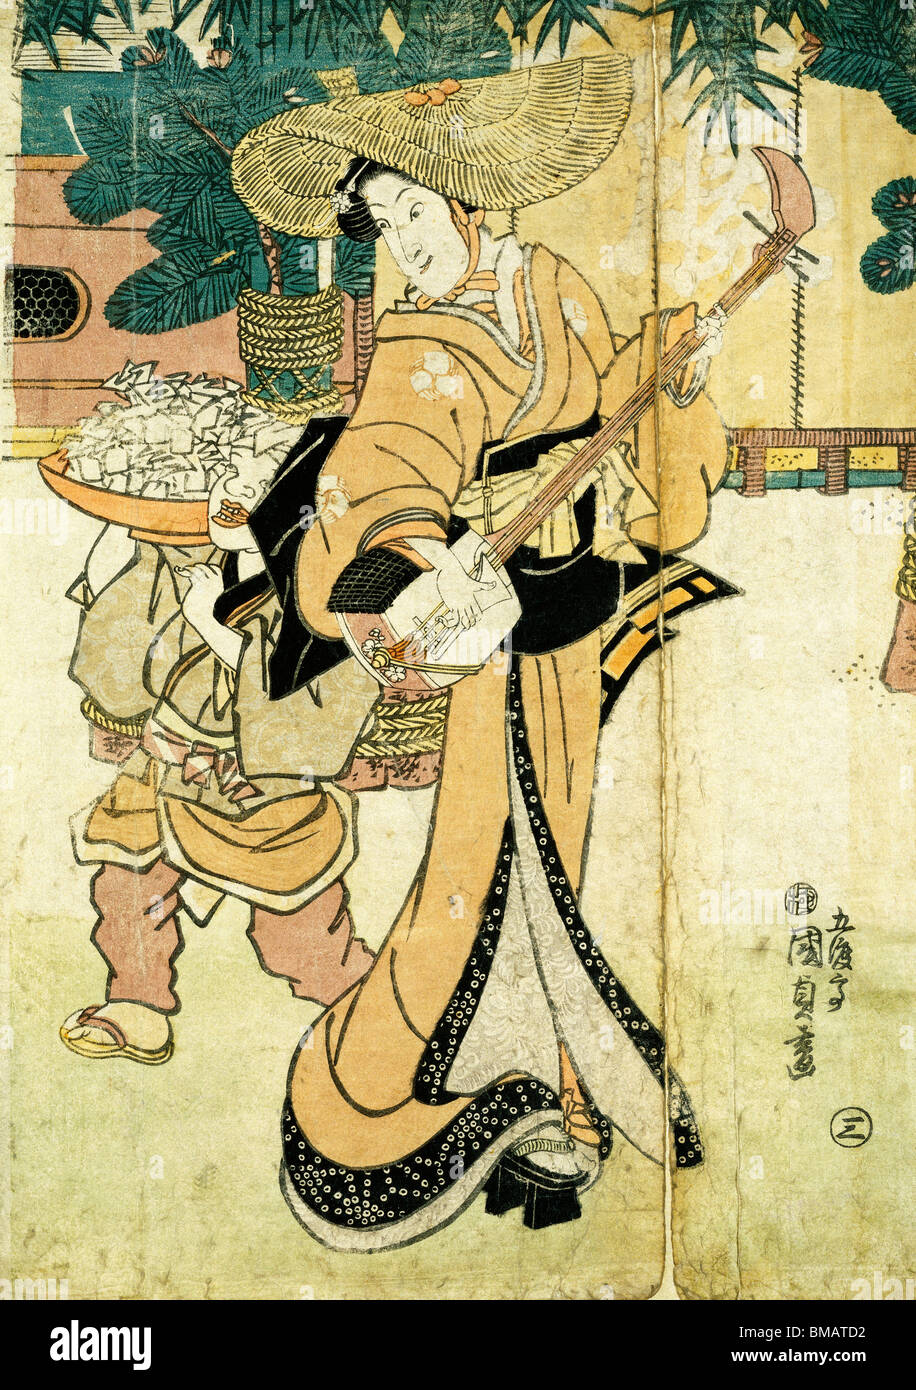 A Musician, by Utagawa Kunisada. Japan, 1864 - Stock Image